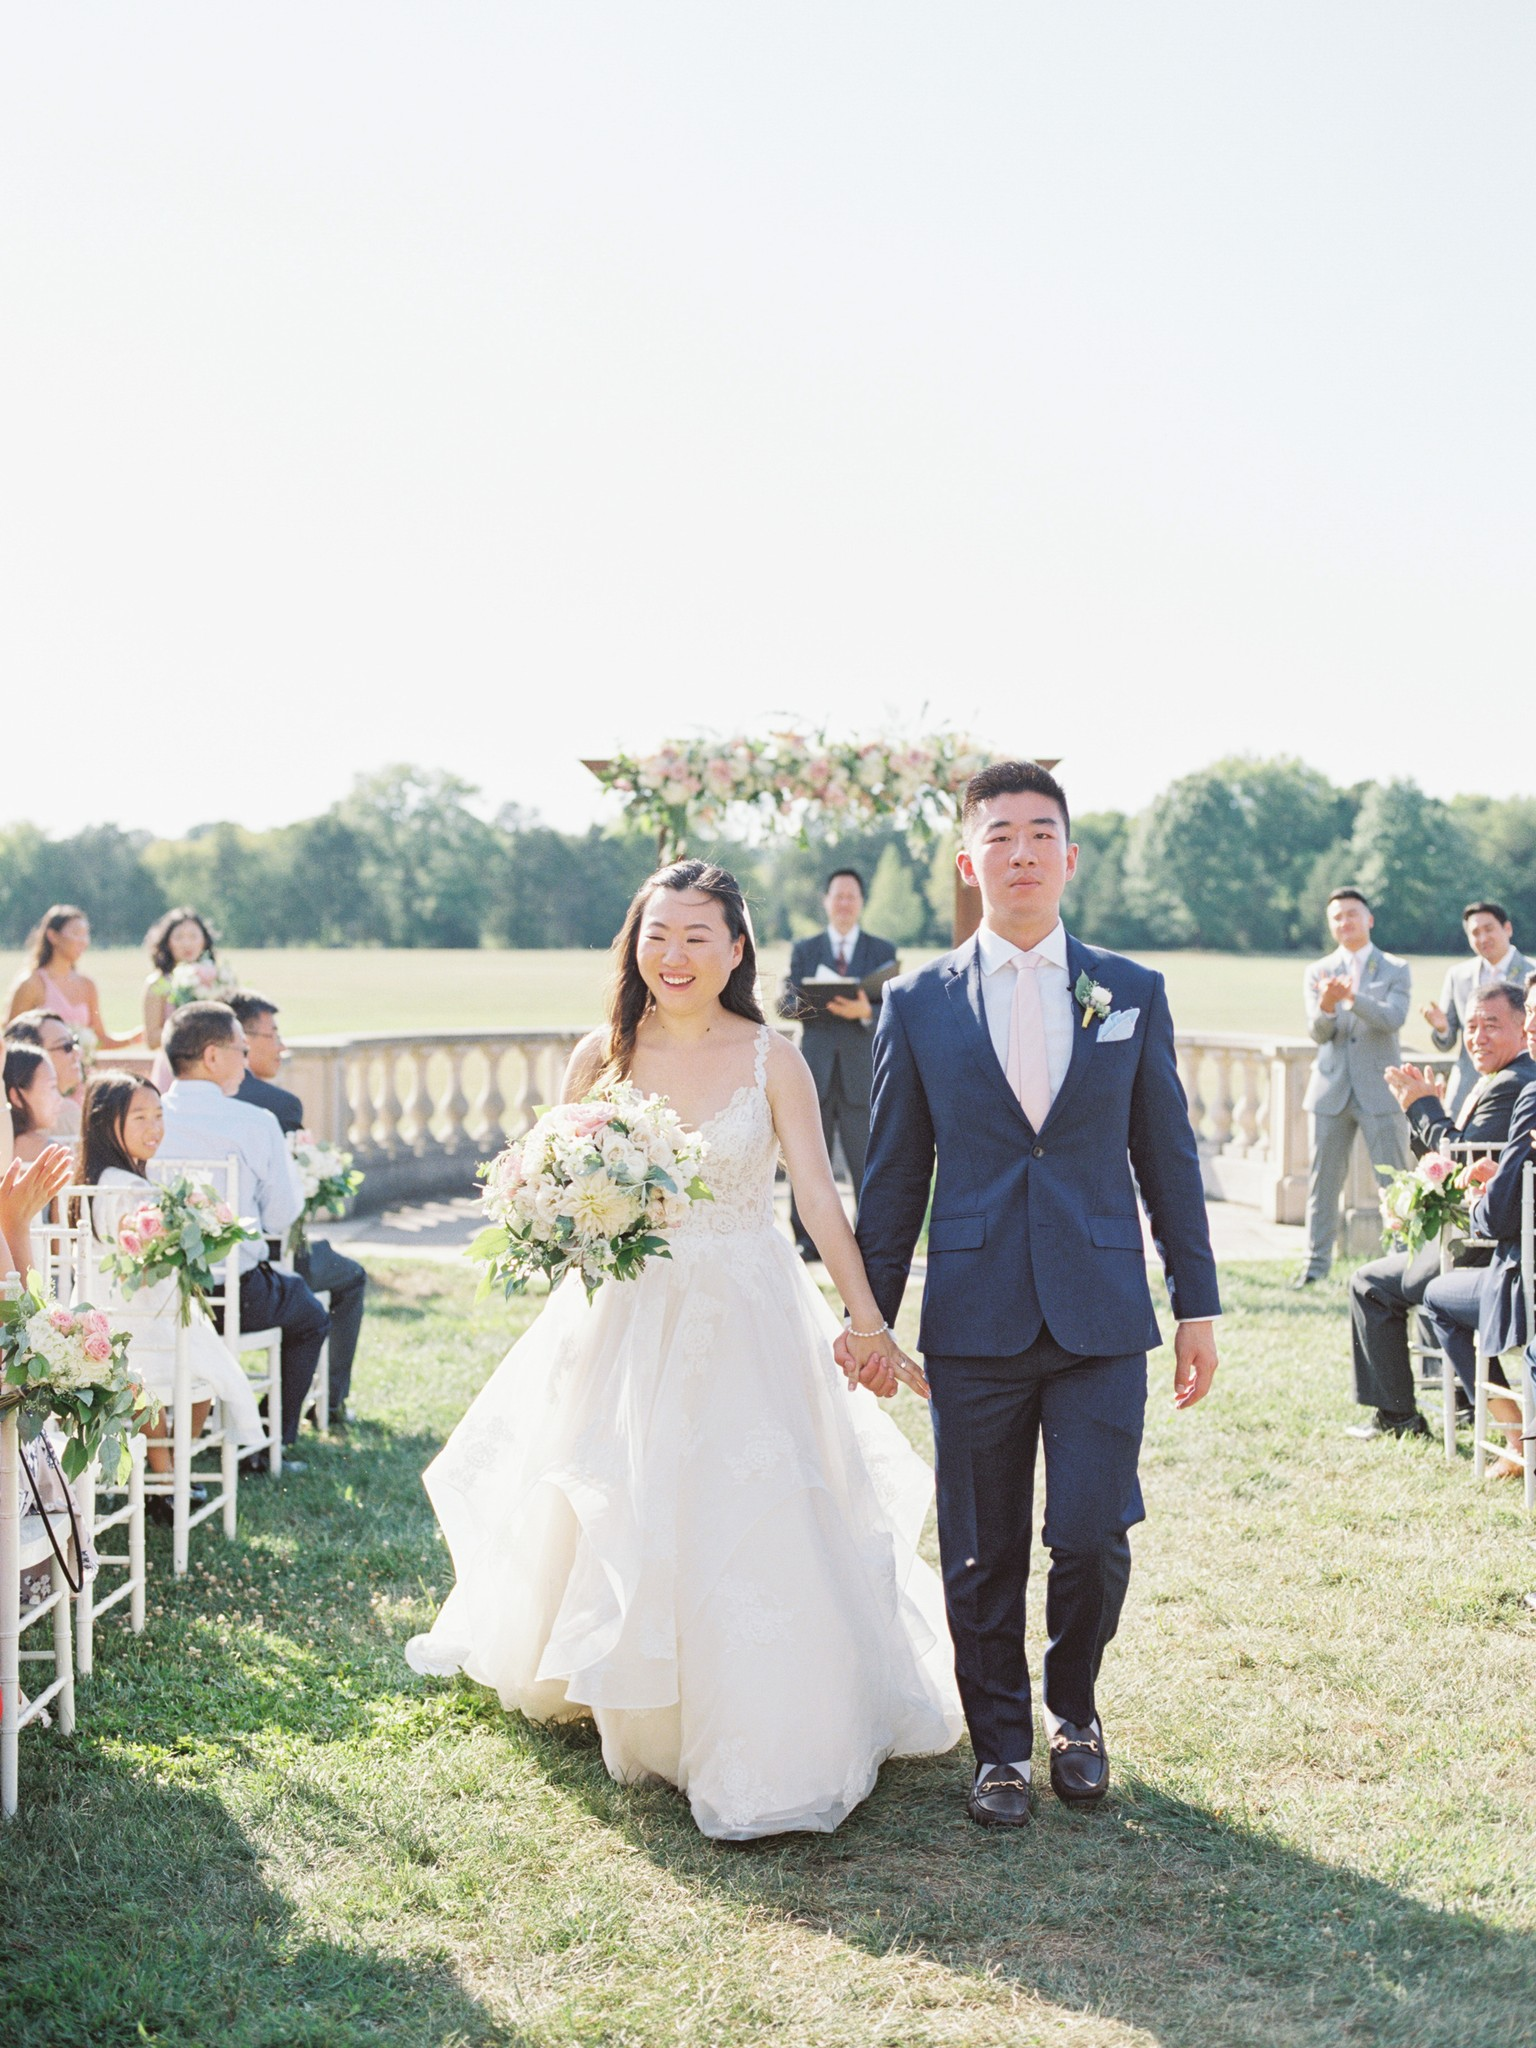 VA-Great-Marsh-Estate-Summer-Wedding-Blush-65.jpg